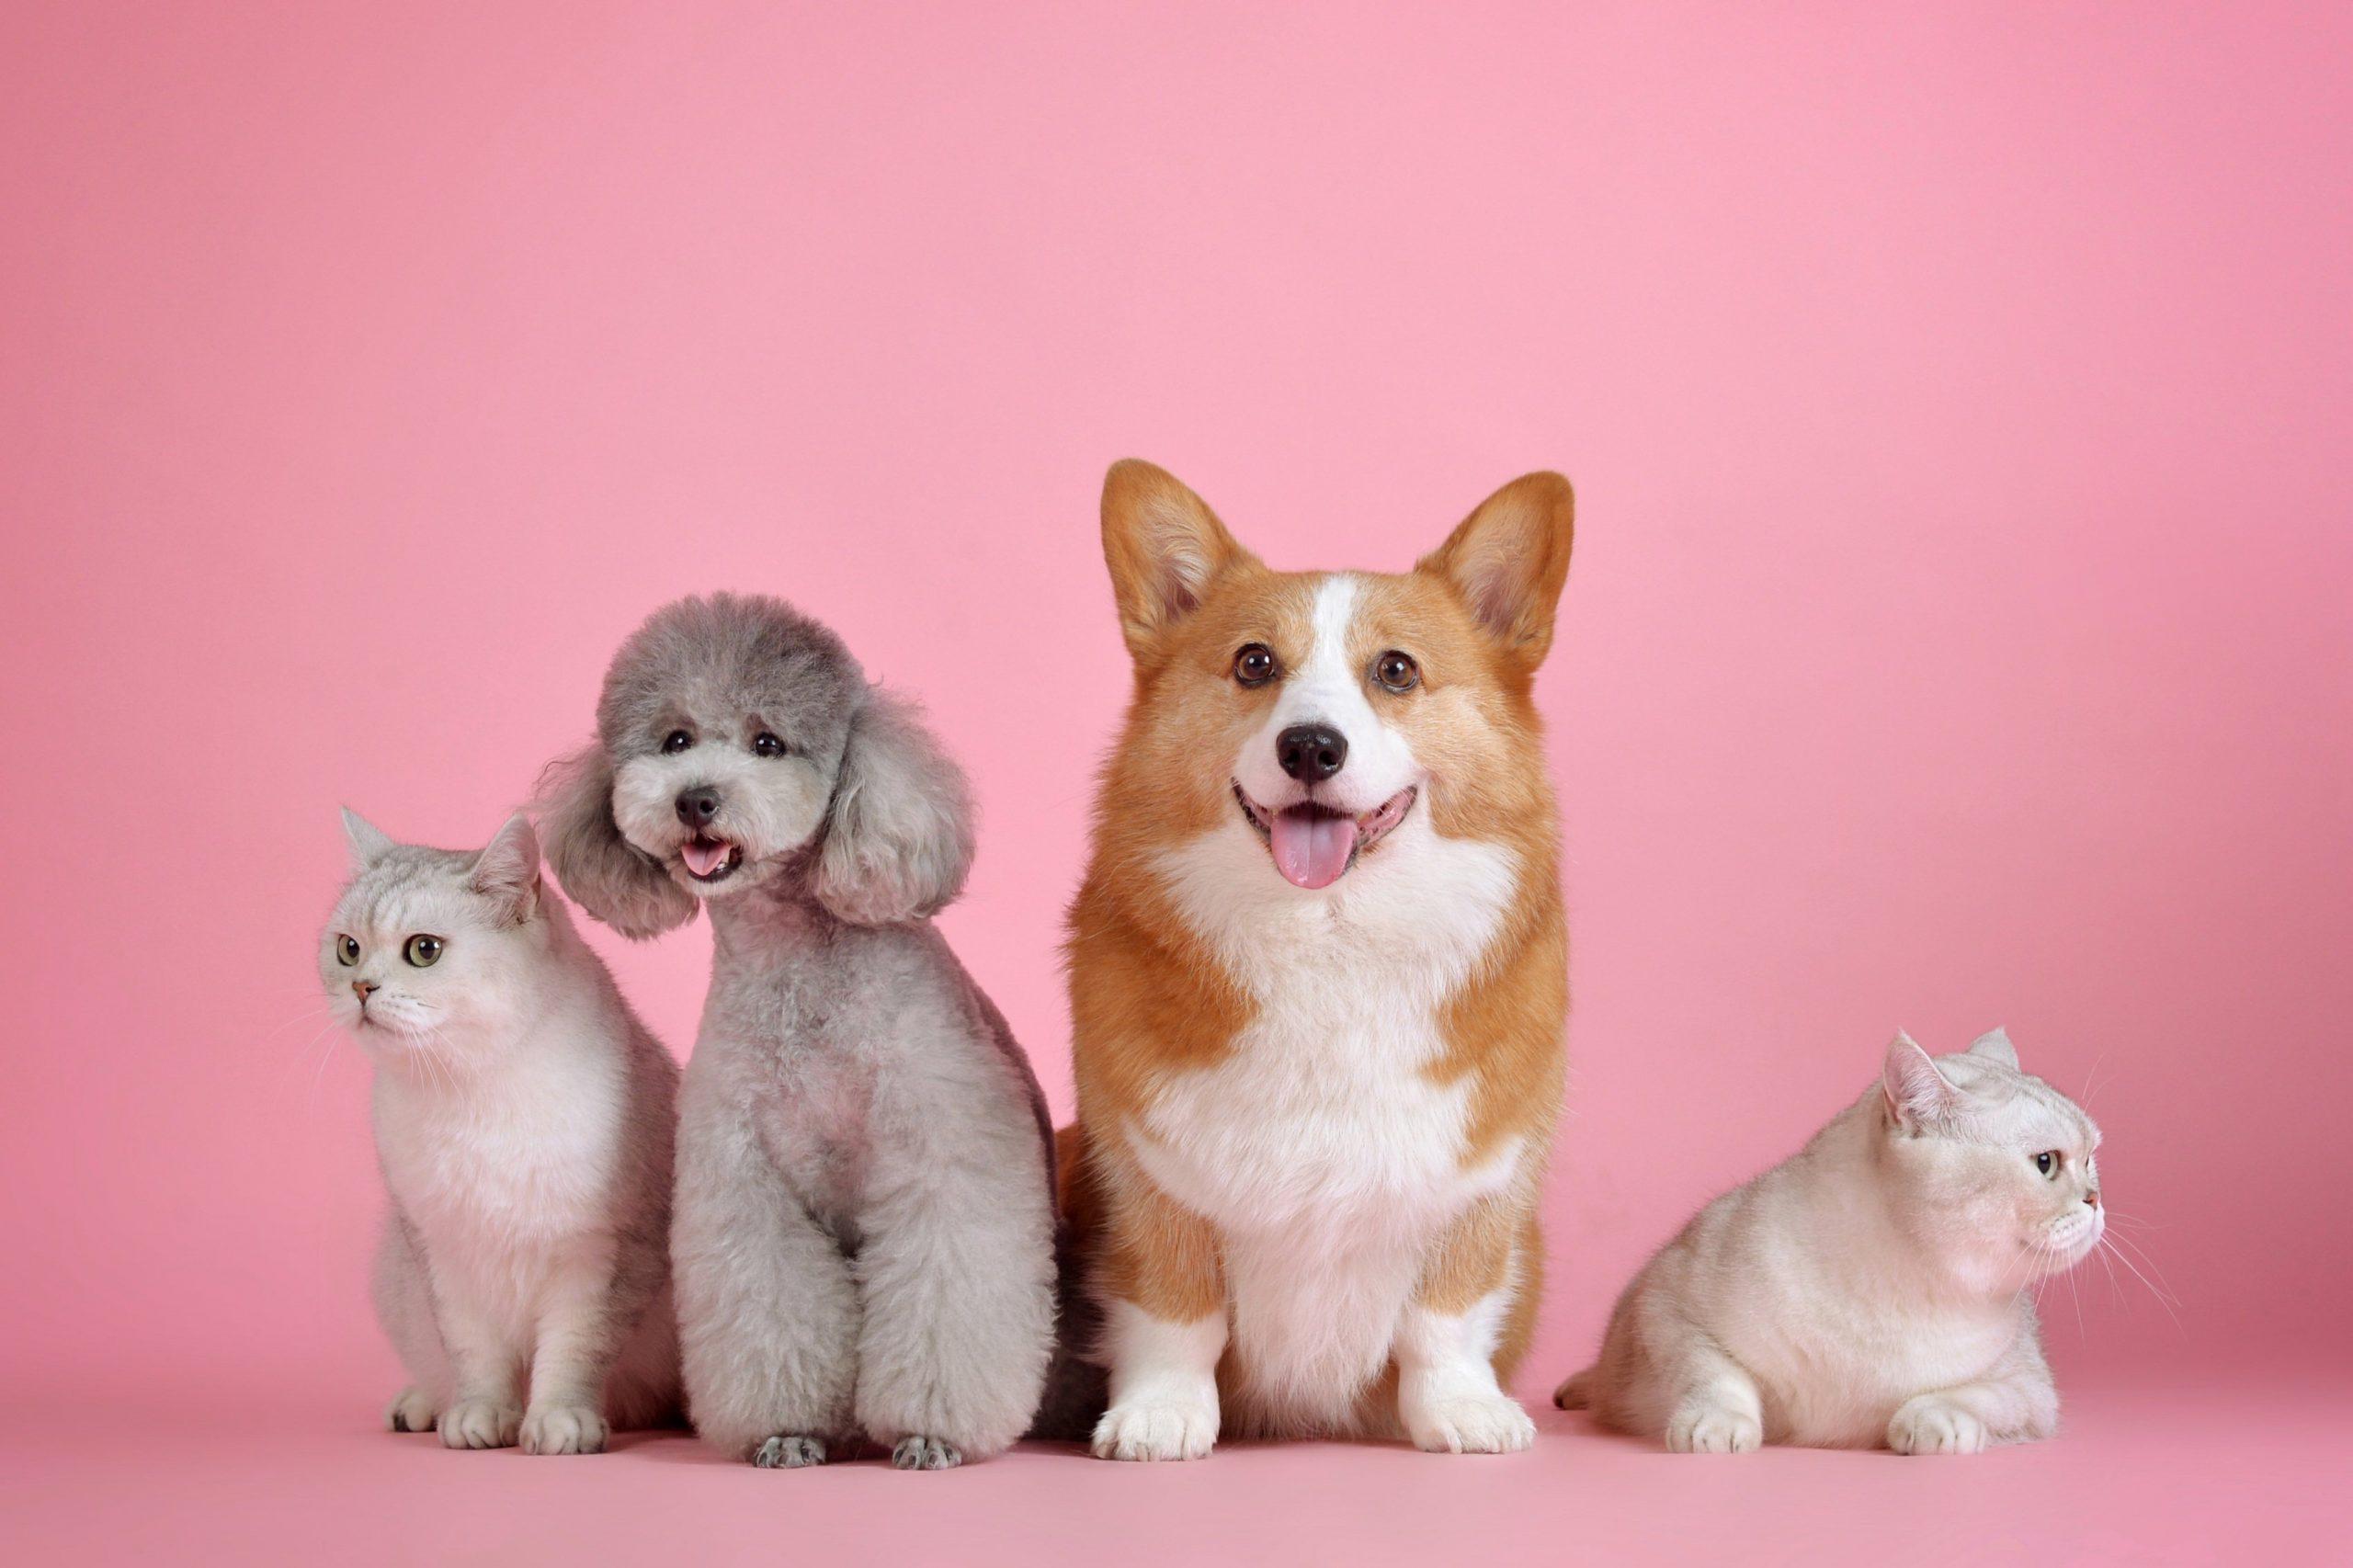 Pet Sitting Customer Reviews and Testimonials